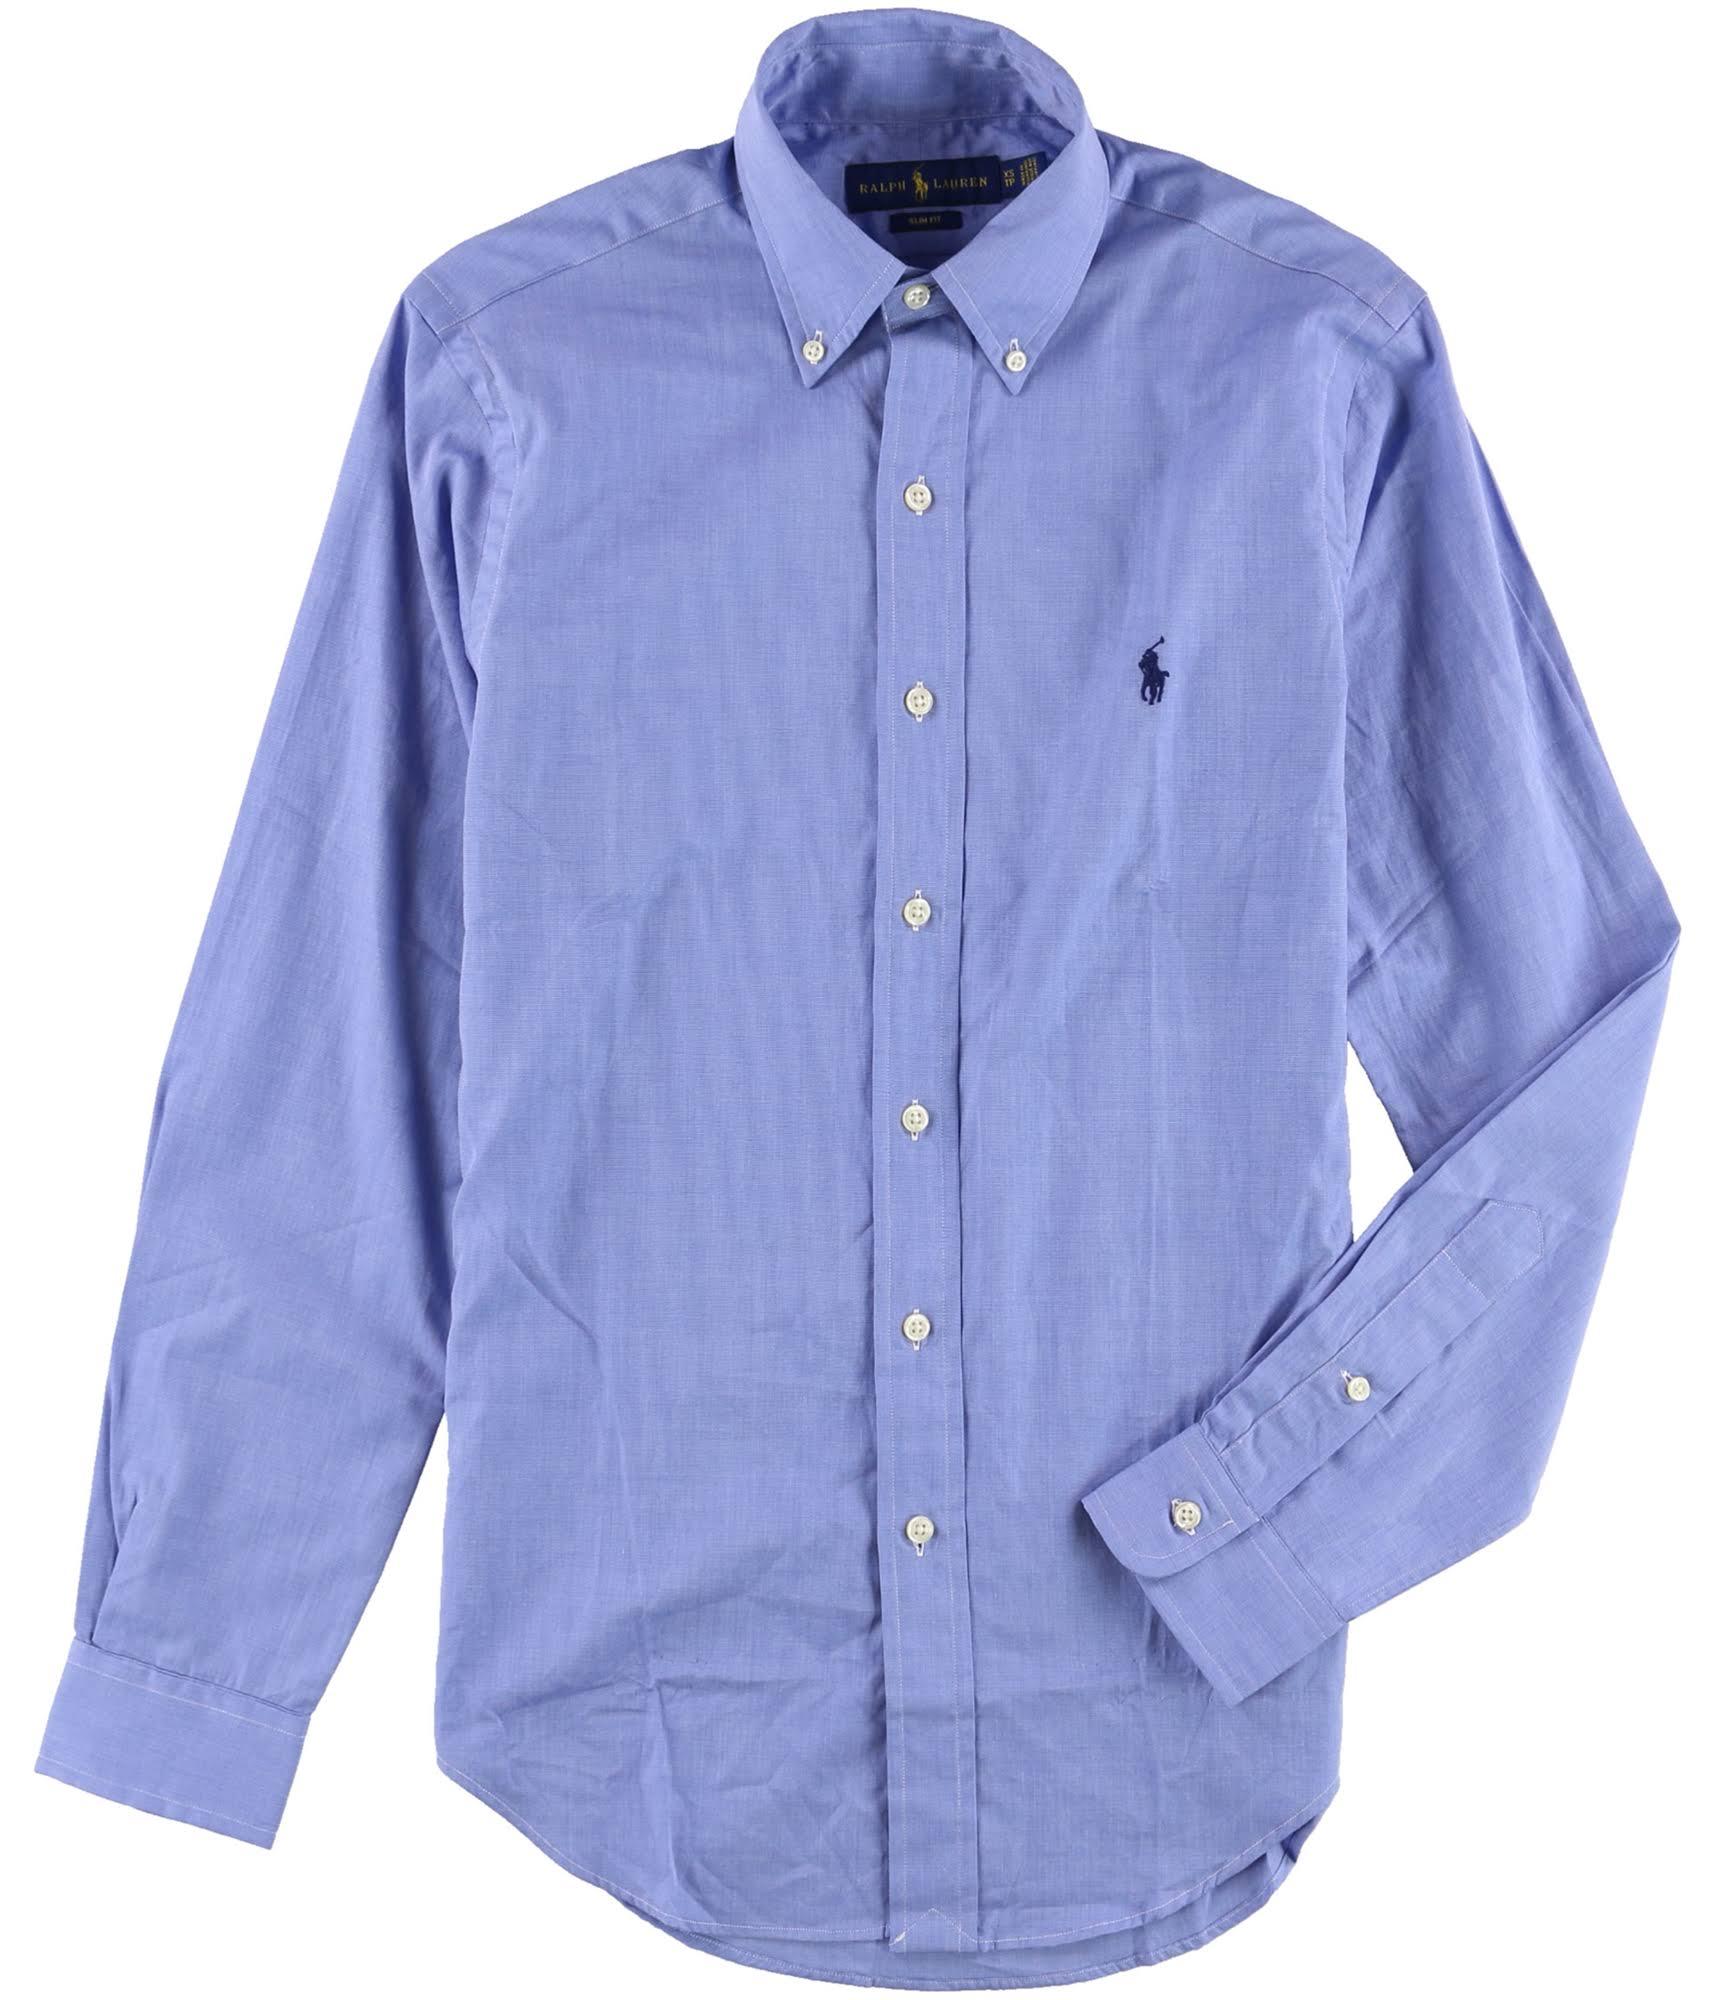 Para Ralph Camisa Básica Lauren Hombre Botones Azul Mbluewht Con wXRqcXzr